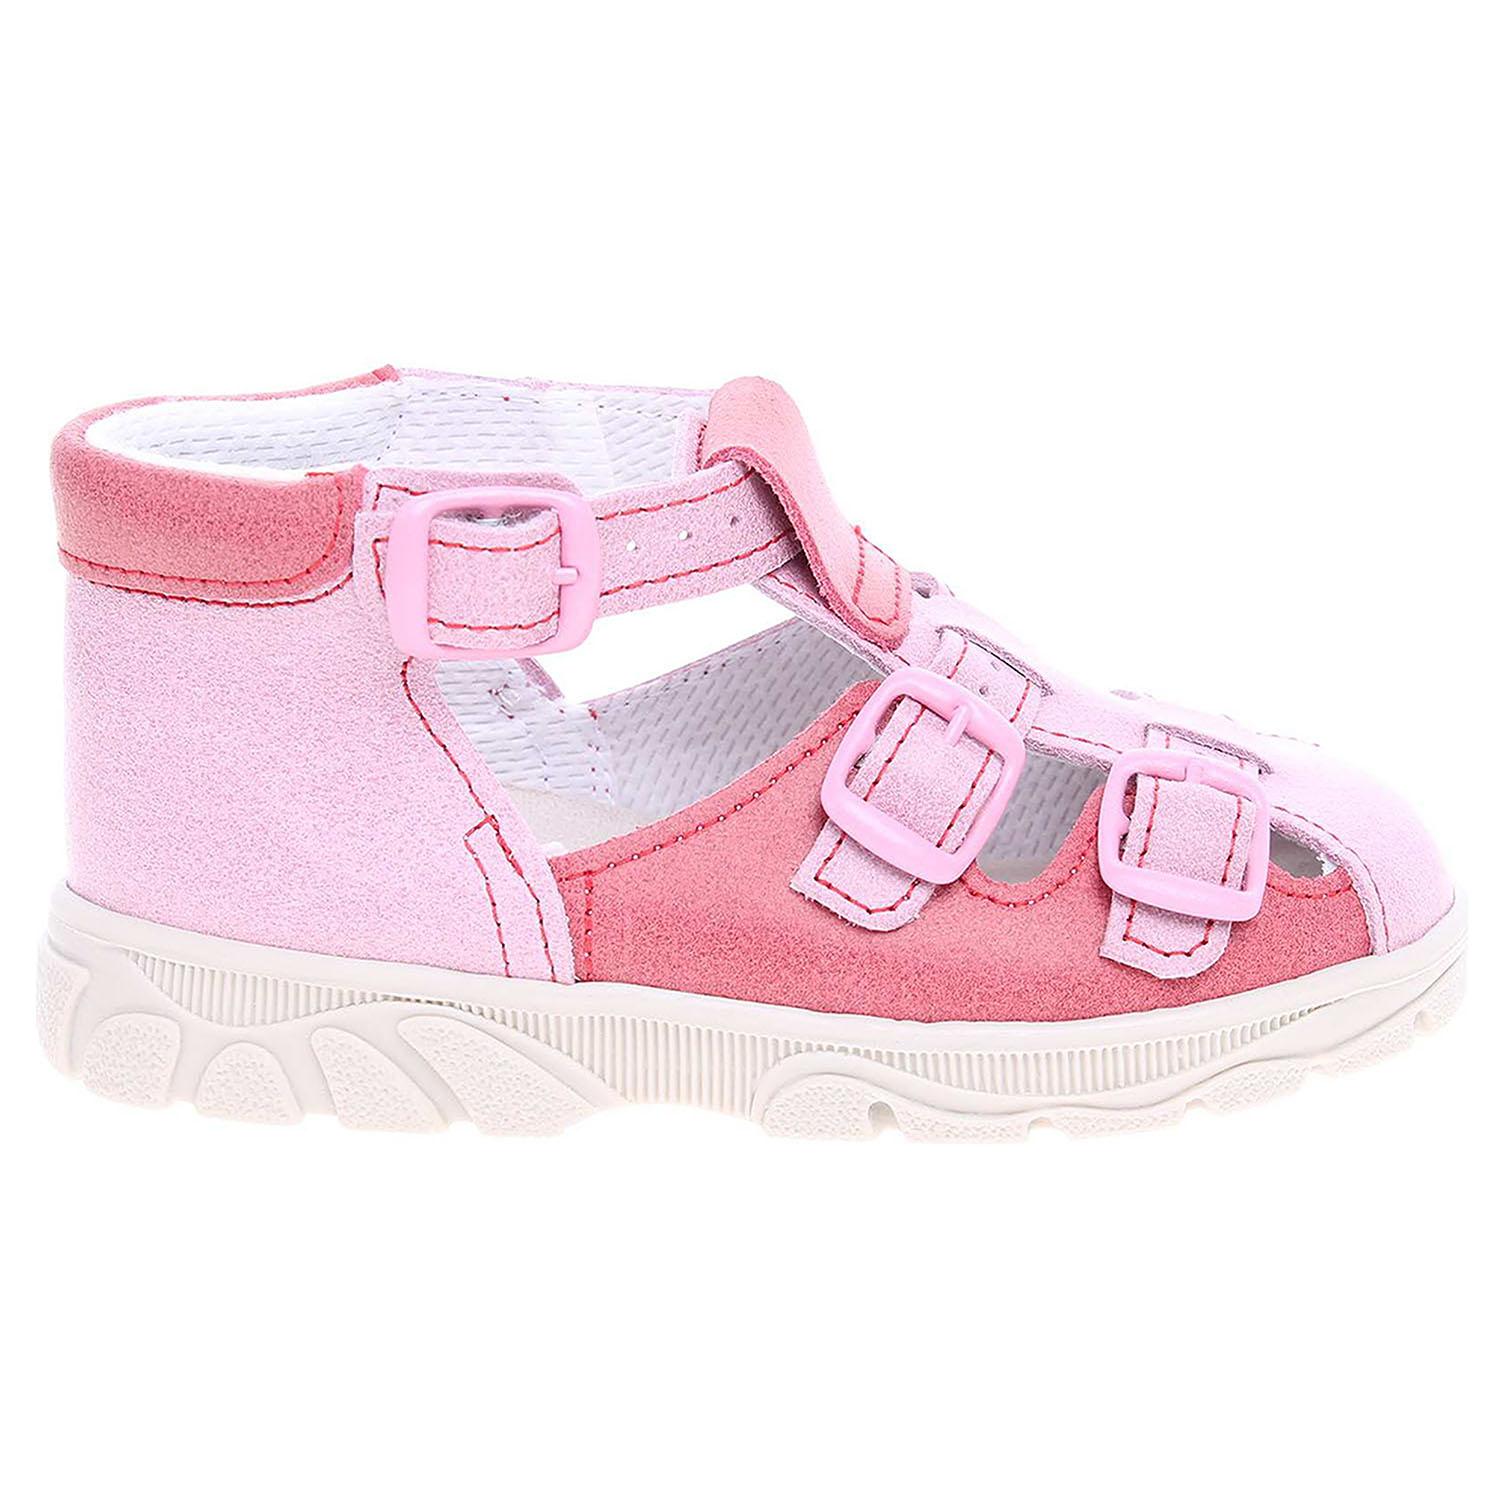 Ecco Dívčí sandály JV0005a-008 růžové 26100104